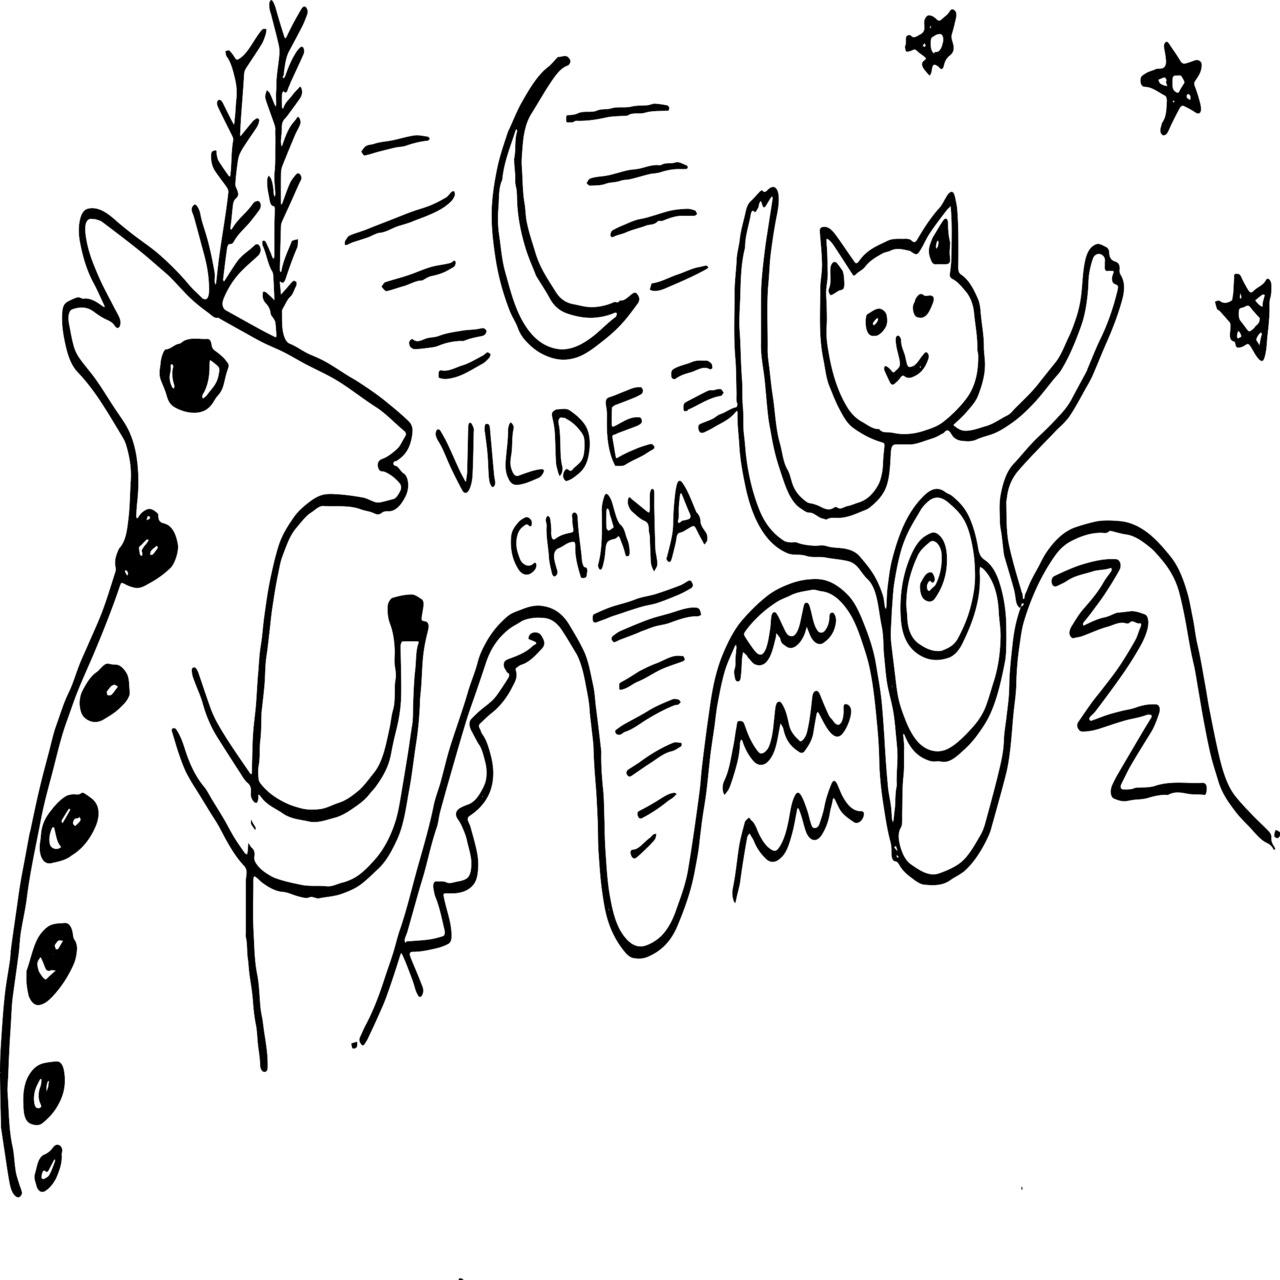 The Vilde Chaya